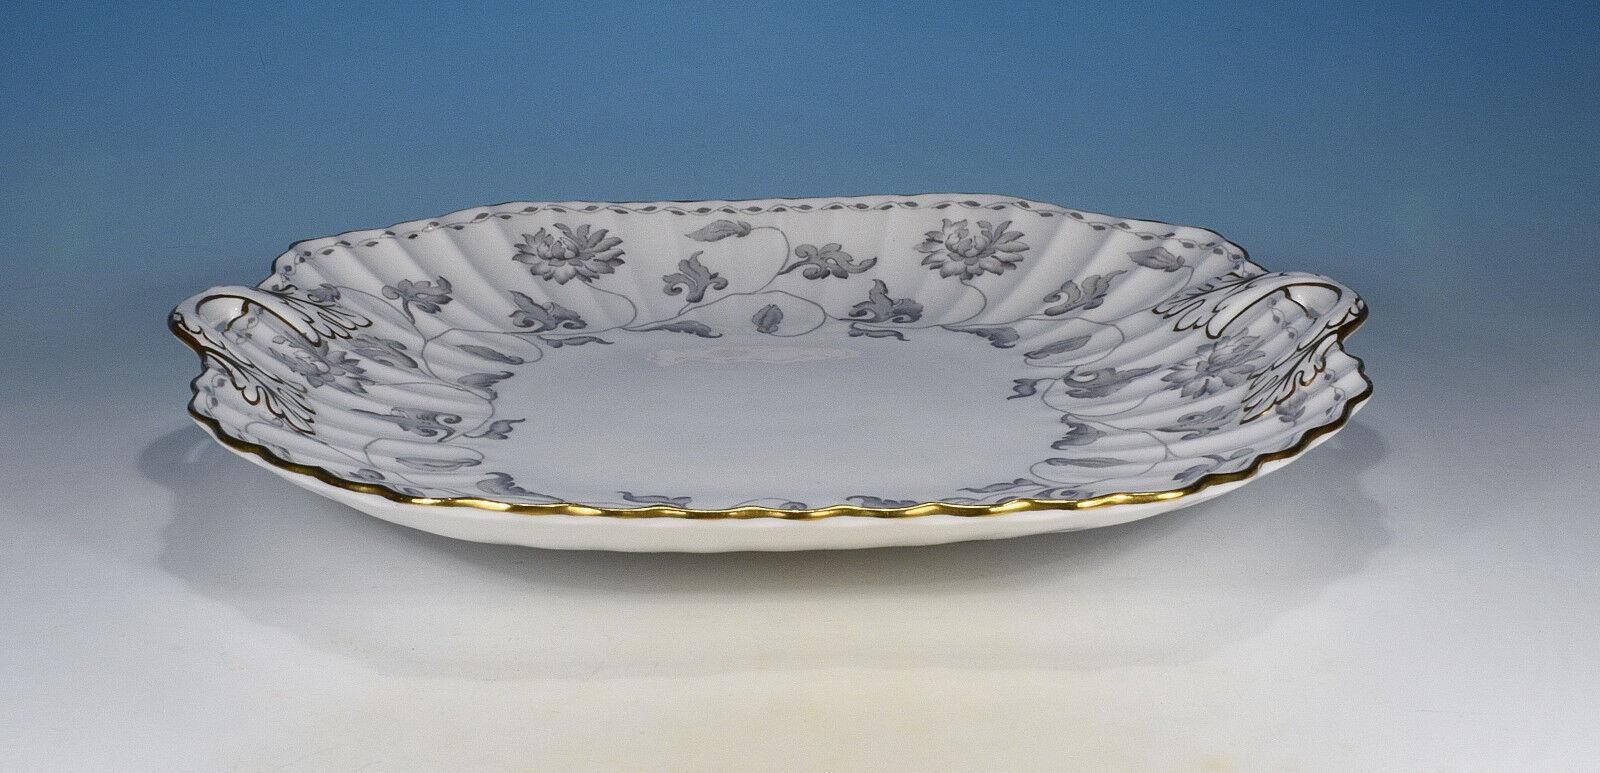 Spode  Colonel    Tablett 26,5 x 23,5 cm. | Billig  a4c184